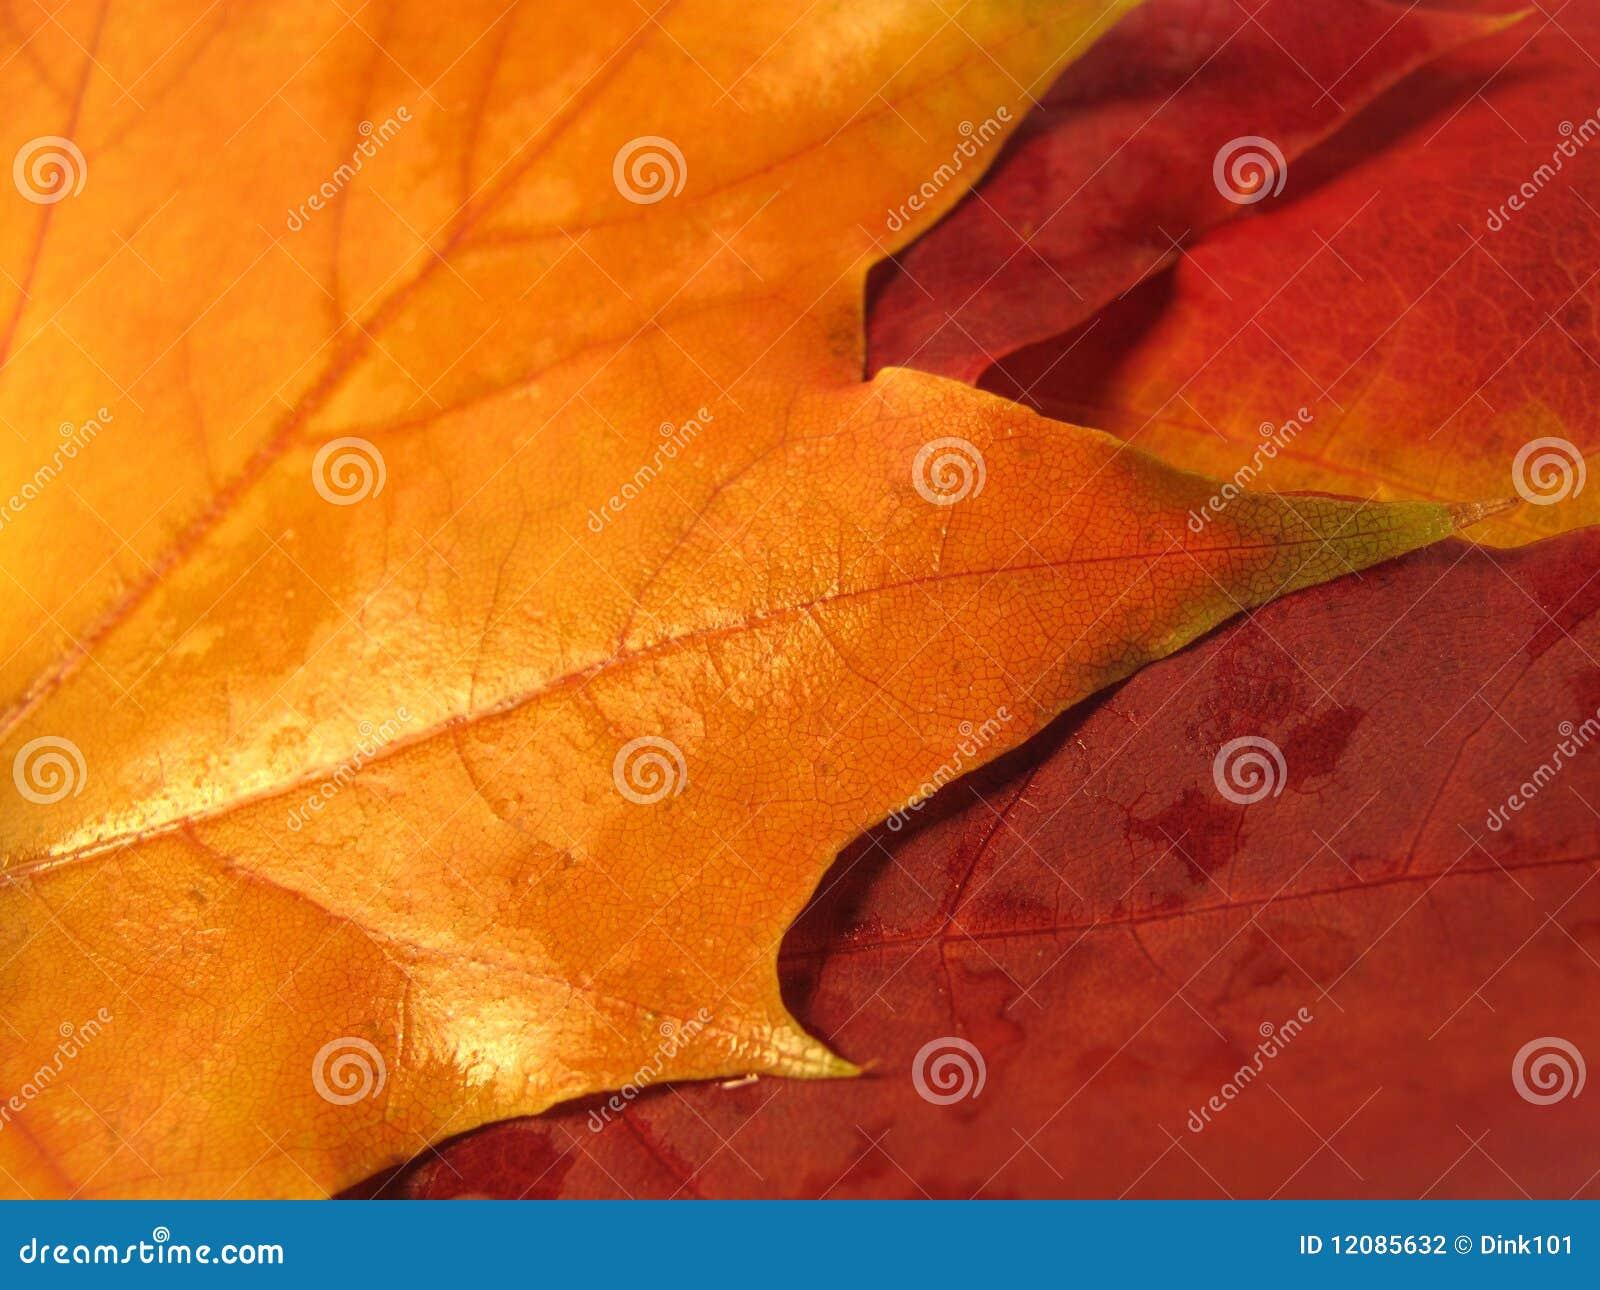 Beautiful colored fall leaves